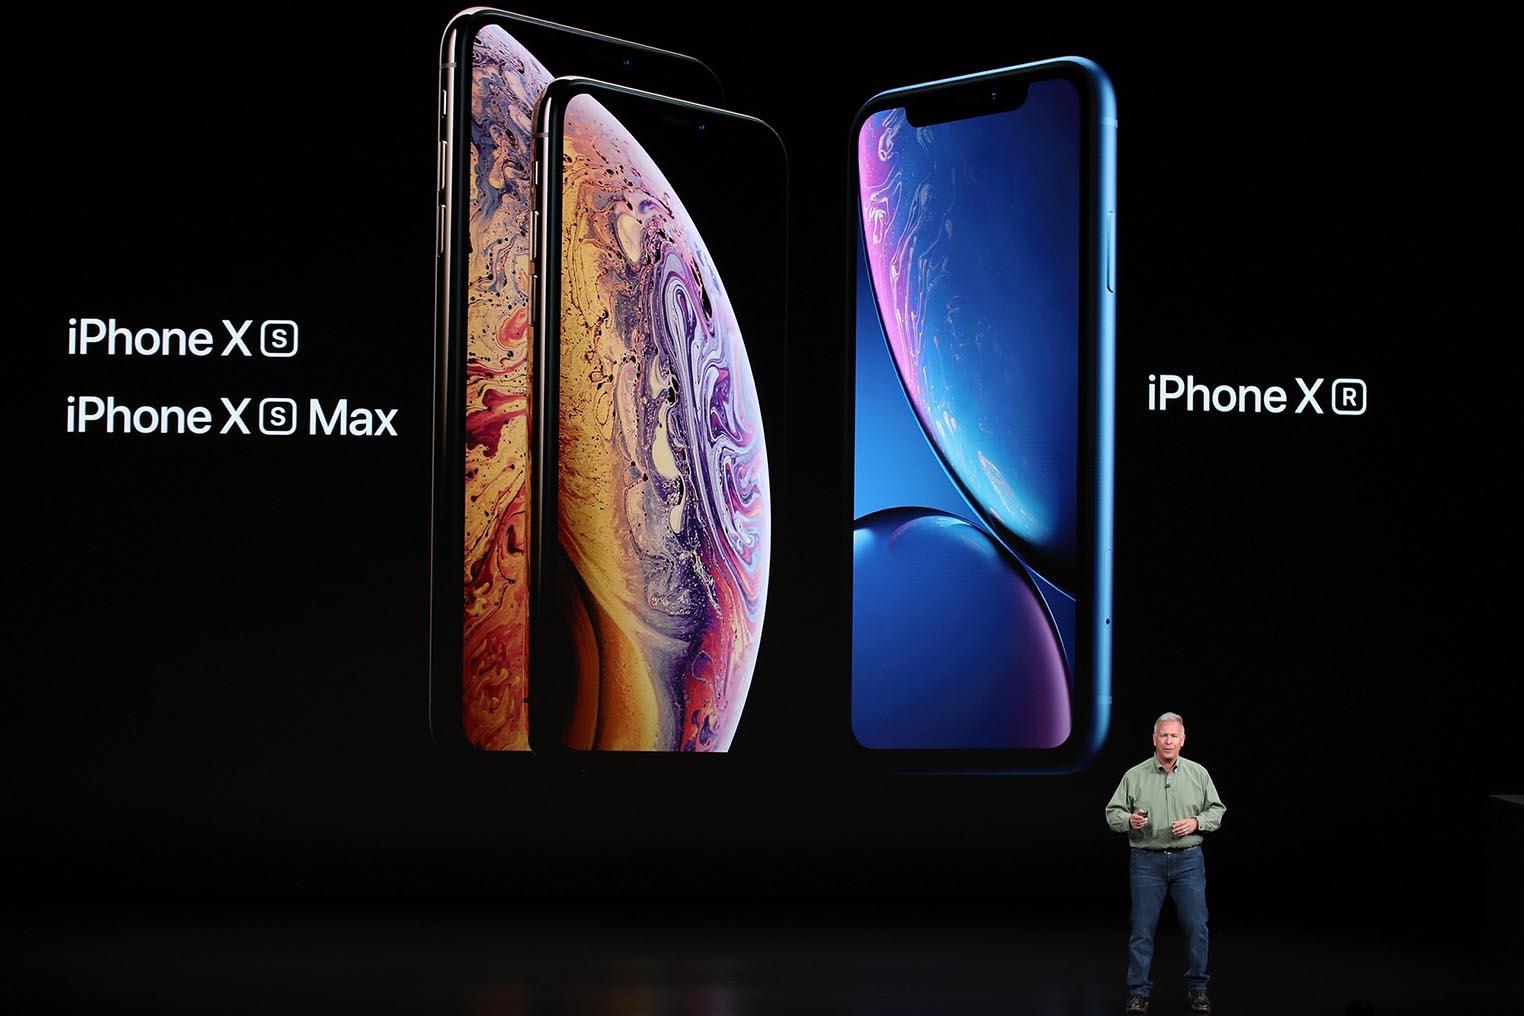 iPhone XS XR keynote 2018